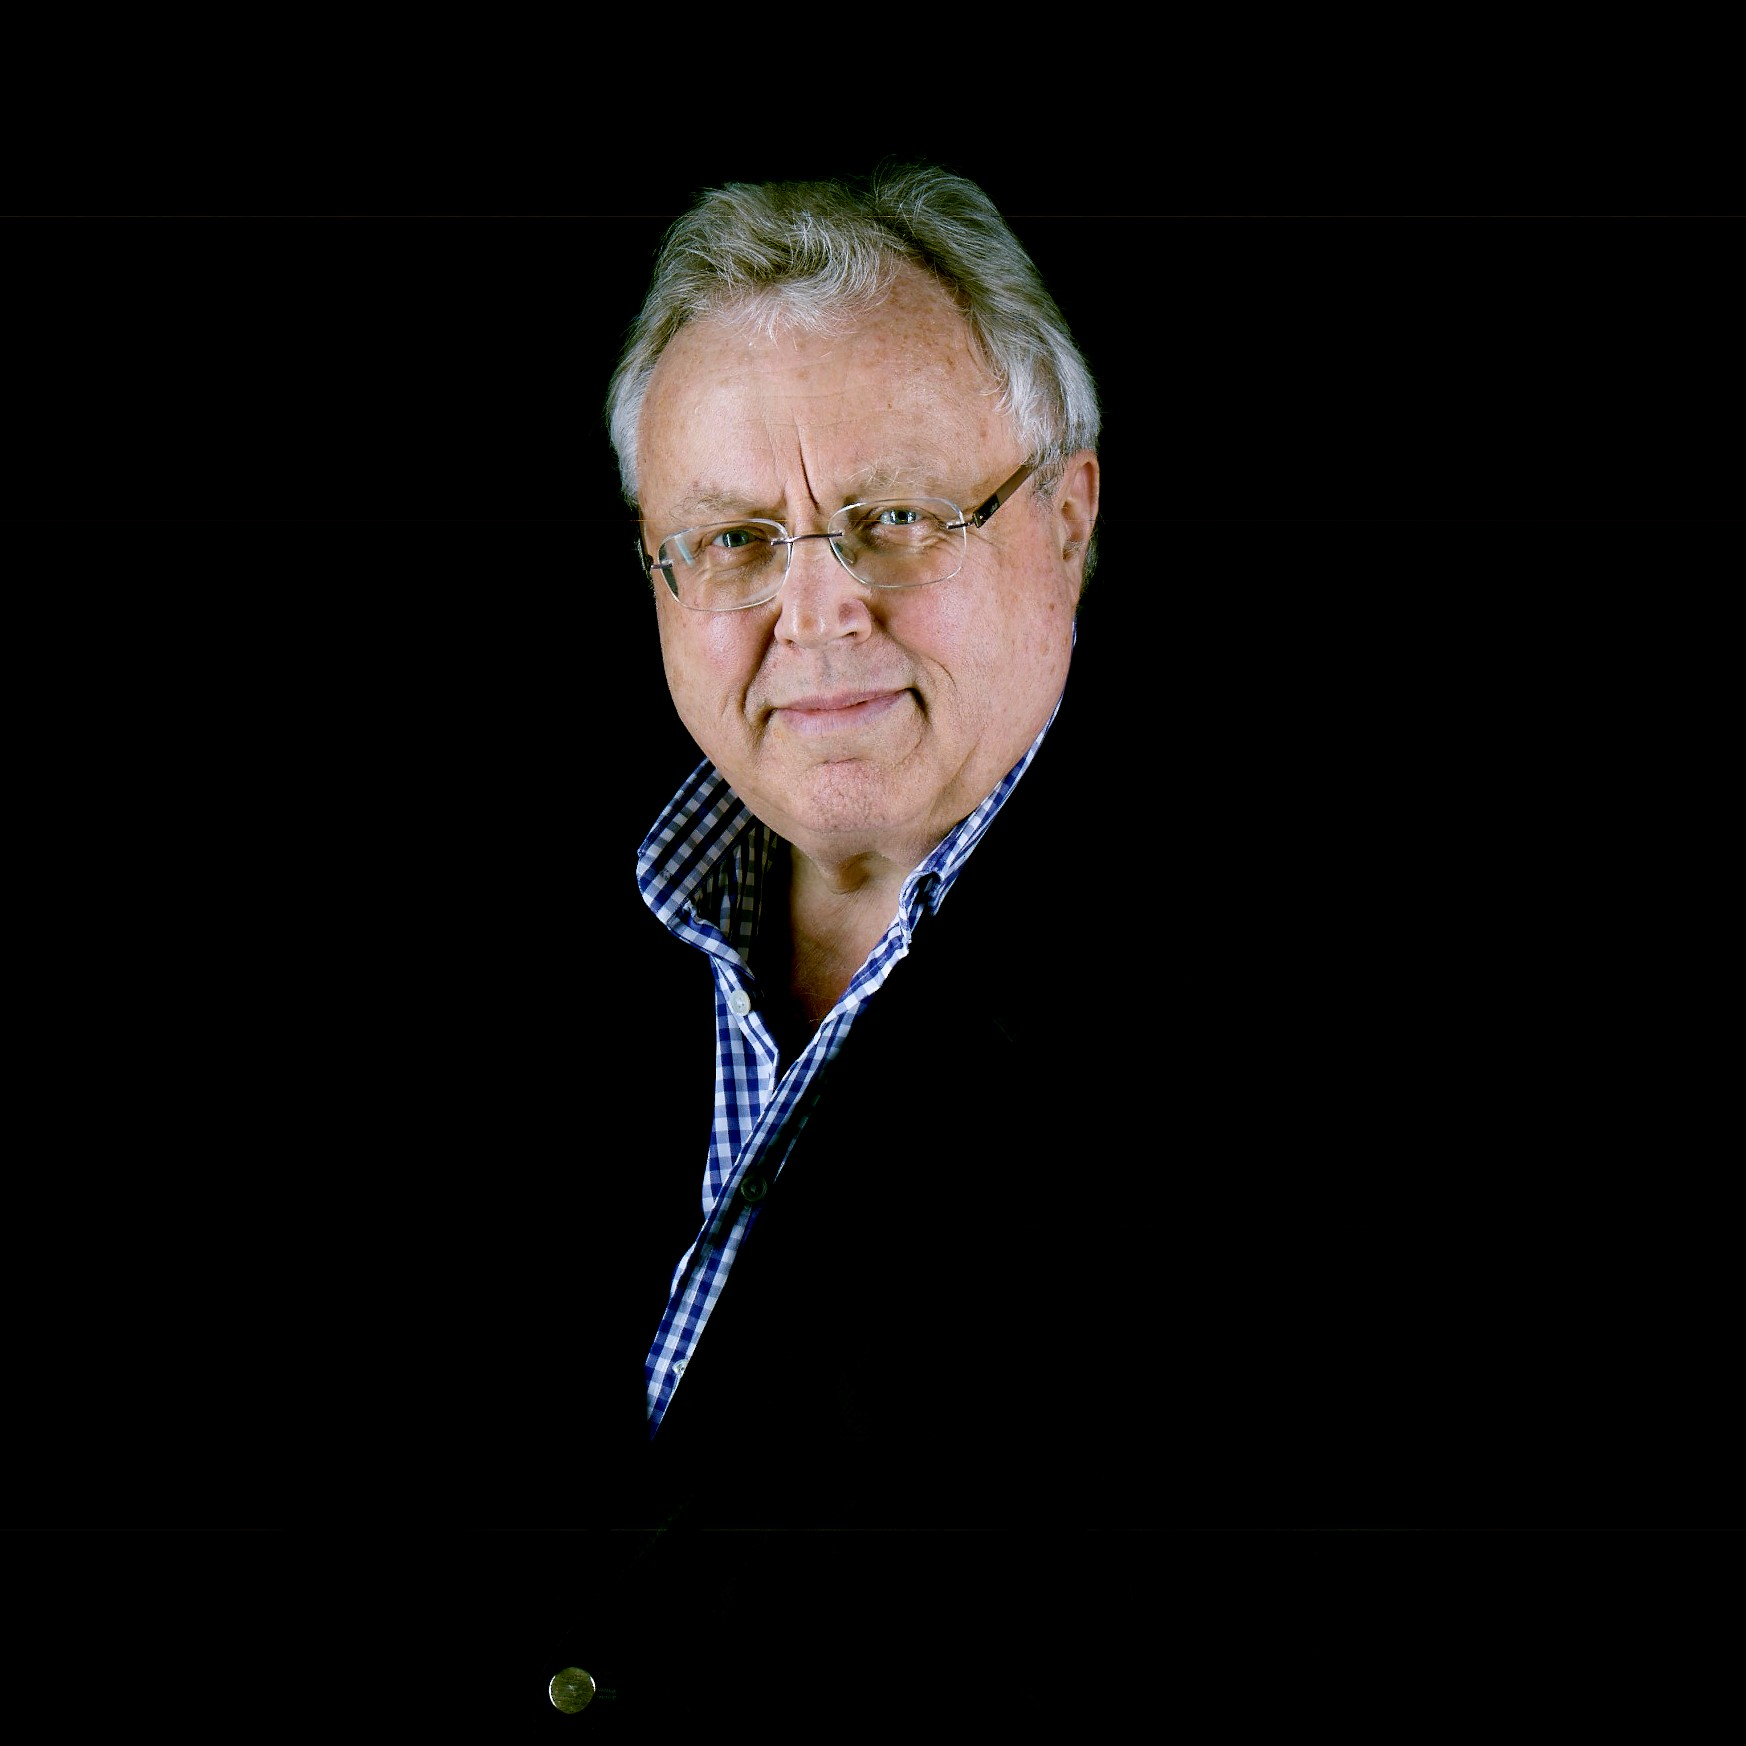 Profile photo of Tom Burke, Chairman of E3G